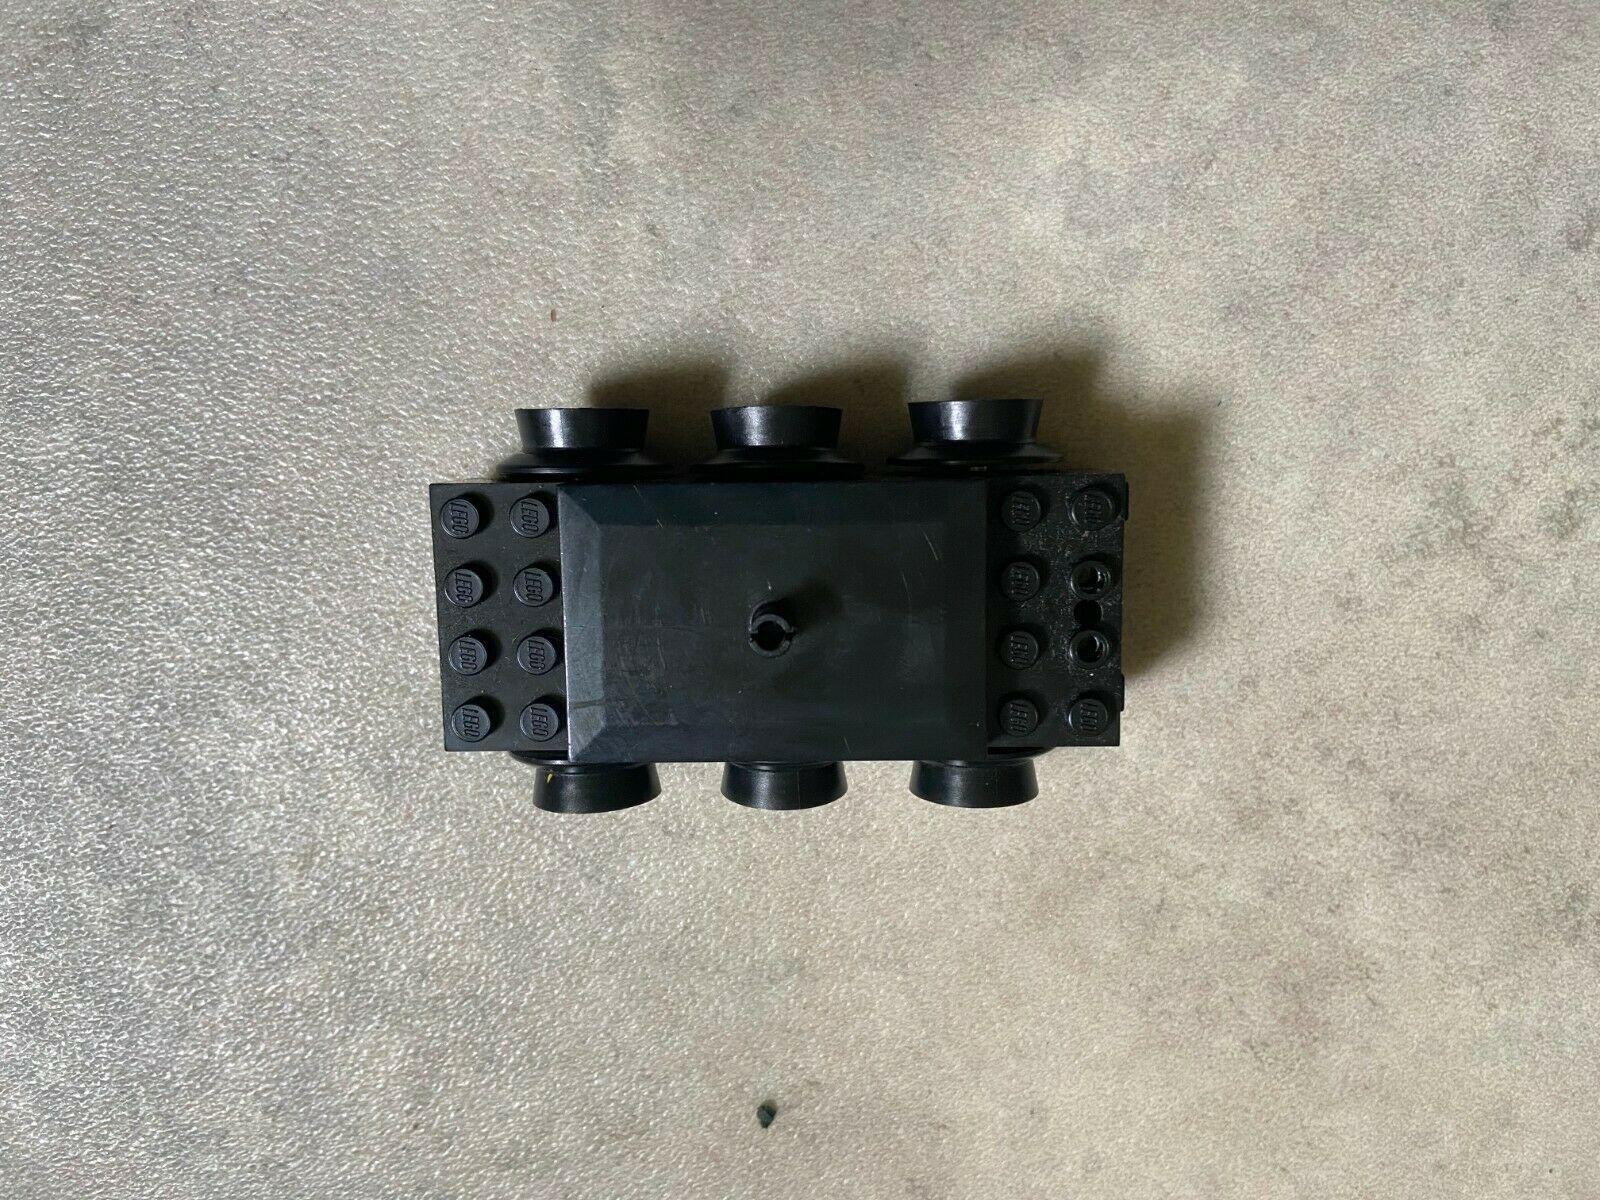 Lego 12V Eisenbahn TRAIN Pleuelstange 7725 7730 7735 7740 7745 7750